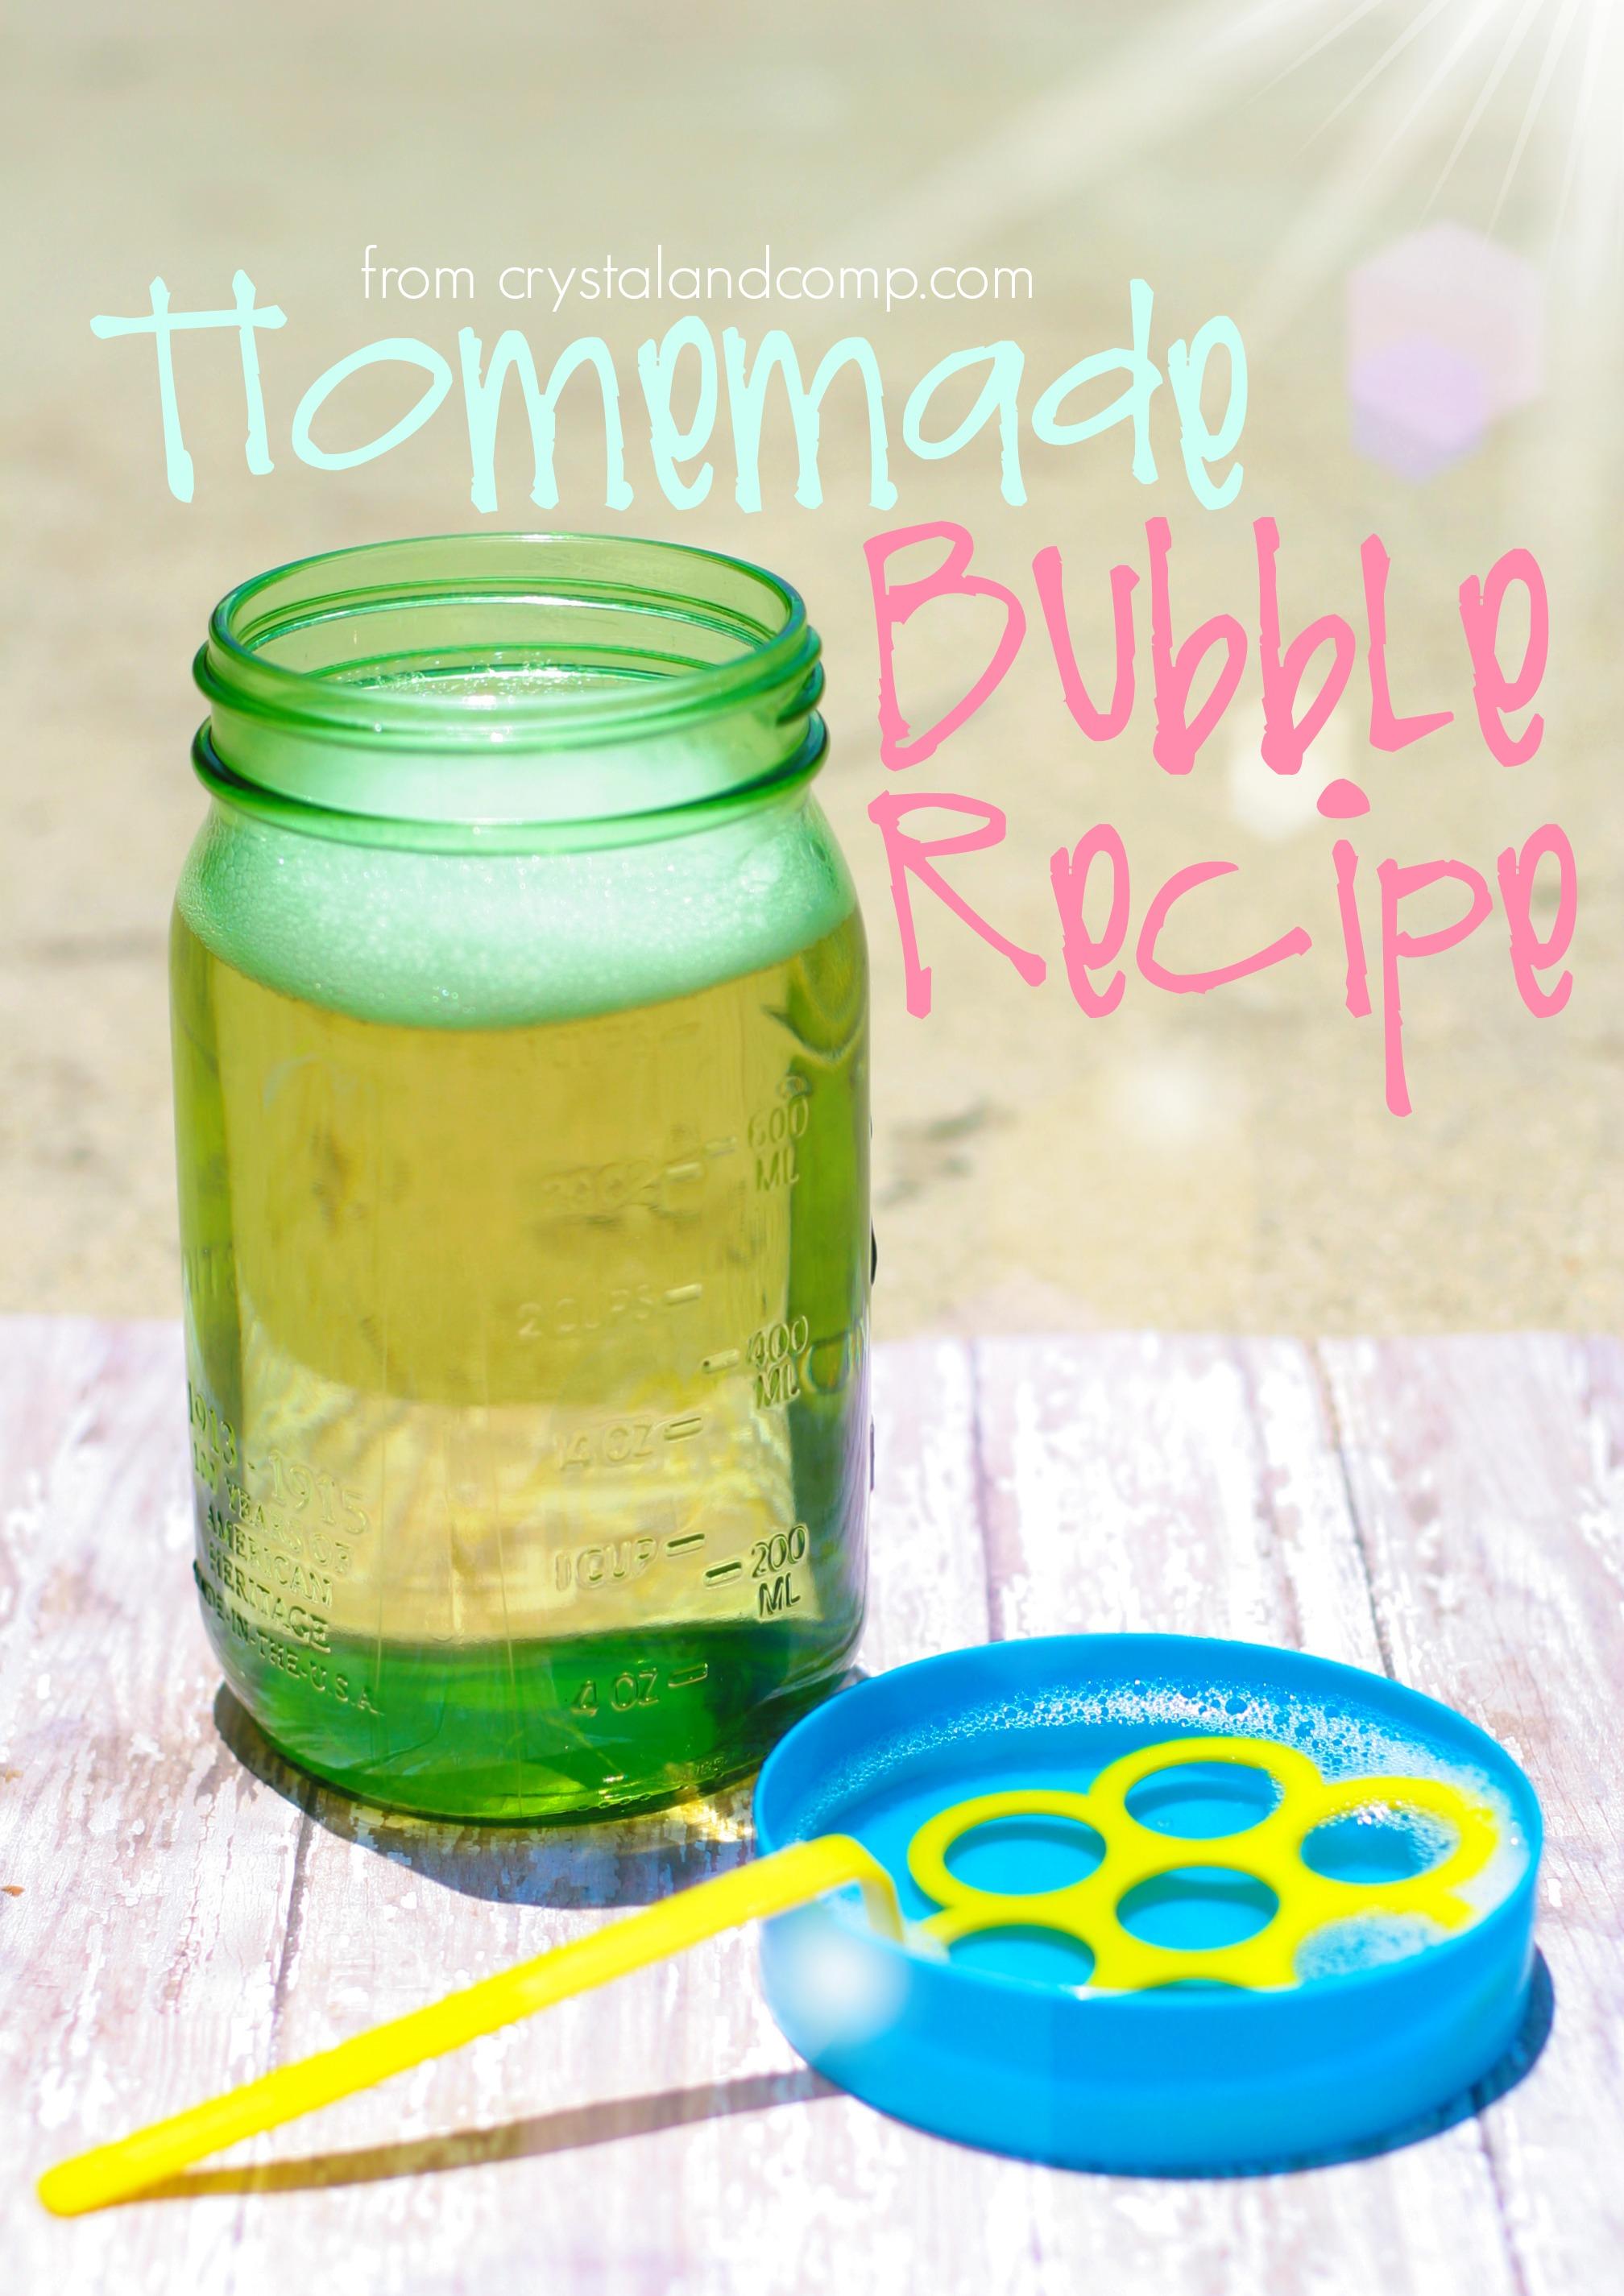 Homemade Bubble Recipe for Kids